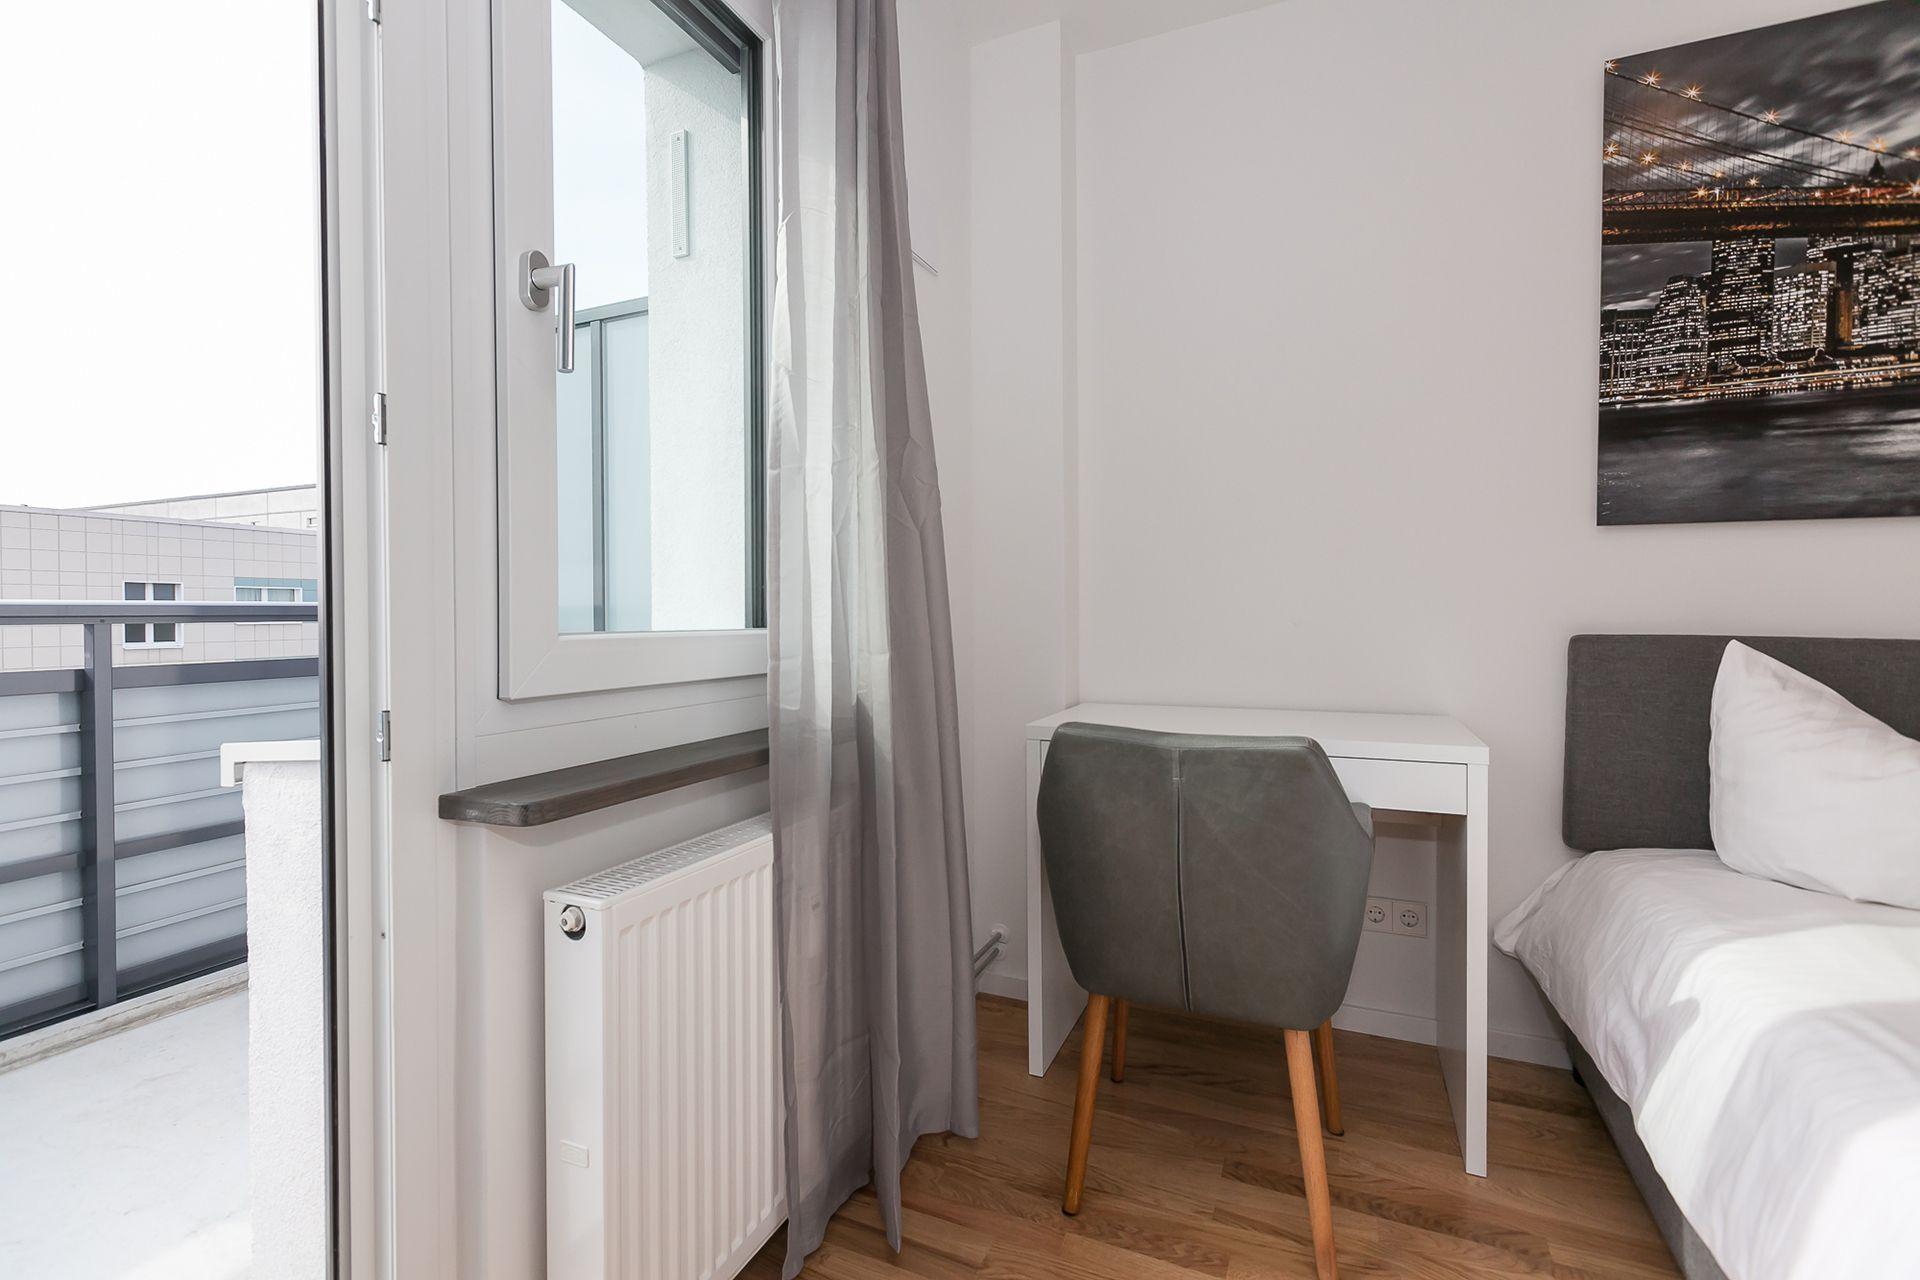 1 Bedroom - Small apartment to rent in Berlin KOEP-KOEP-0406-0